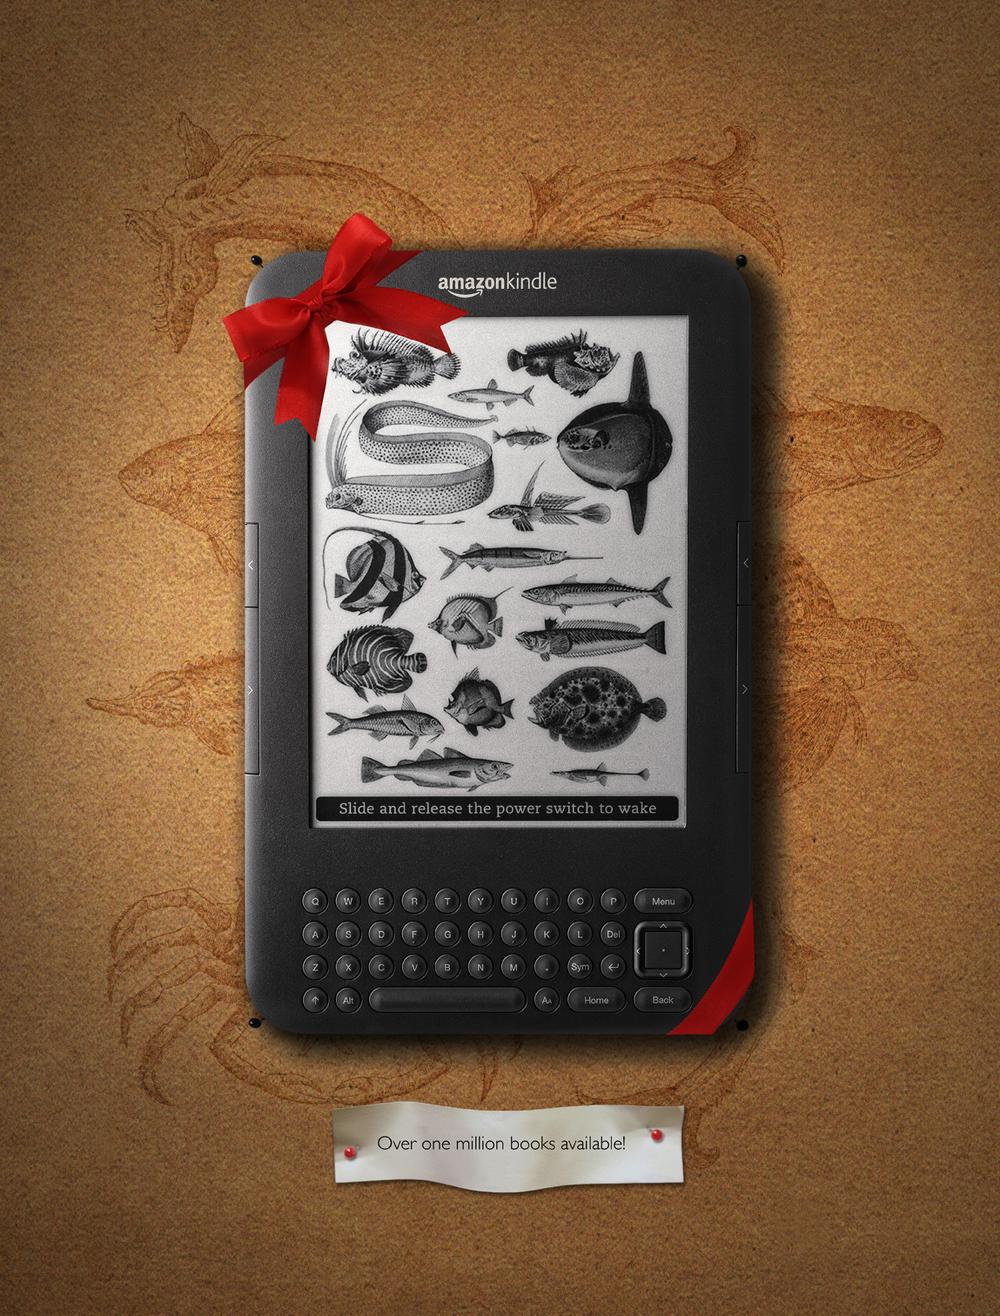 KindleDiagramsmall.jpg